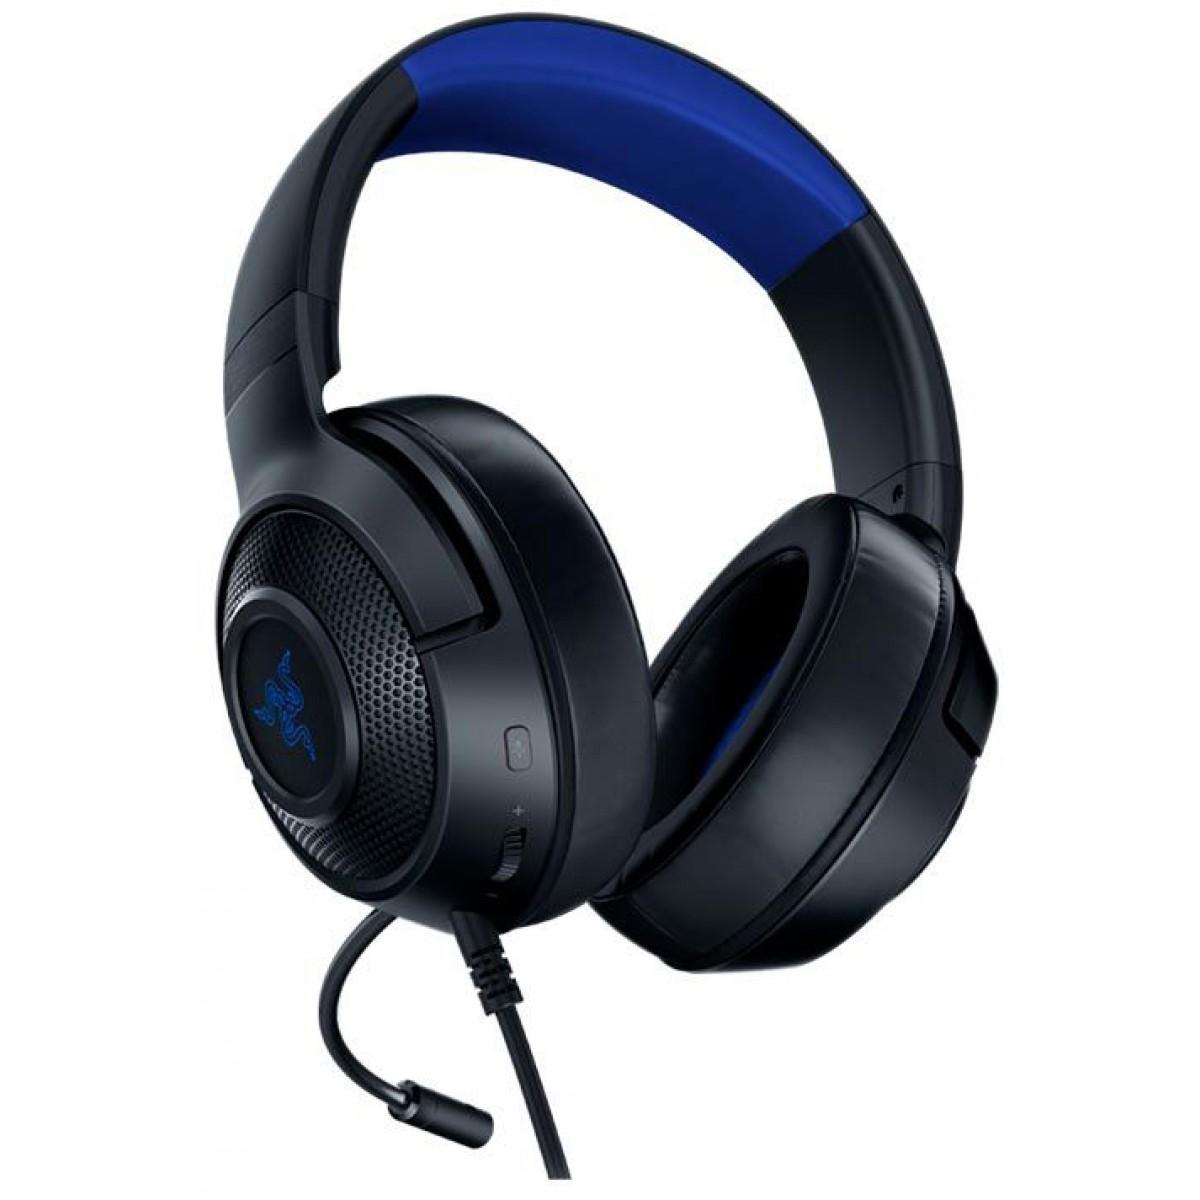 Headset Gamer Razer Kraken X, Xbox One, PS4, Switch, Black